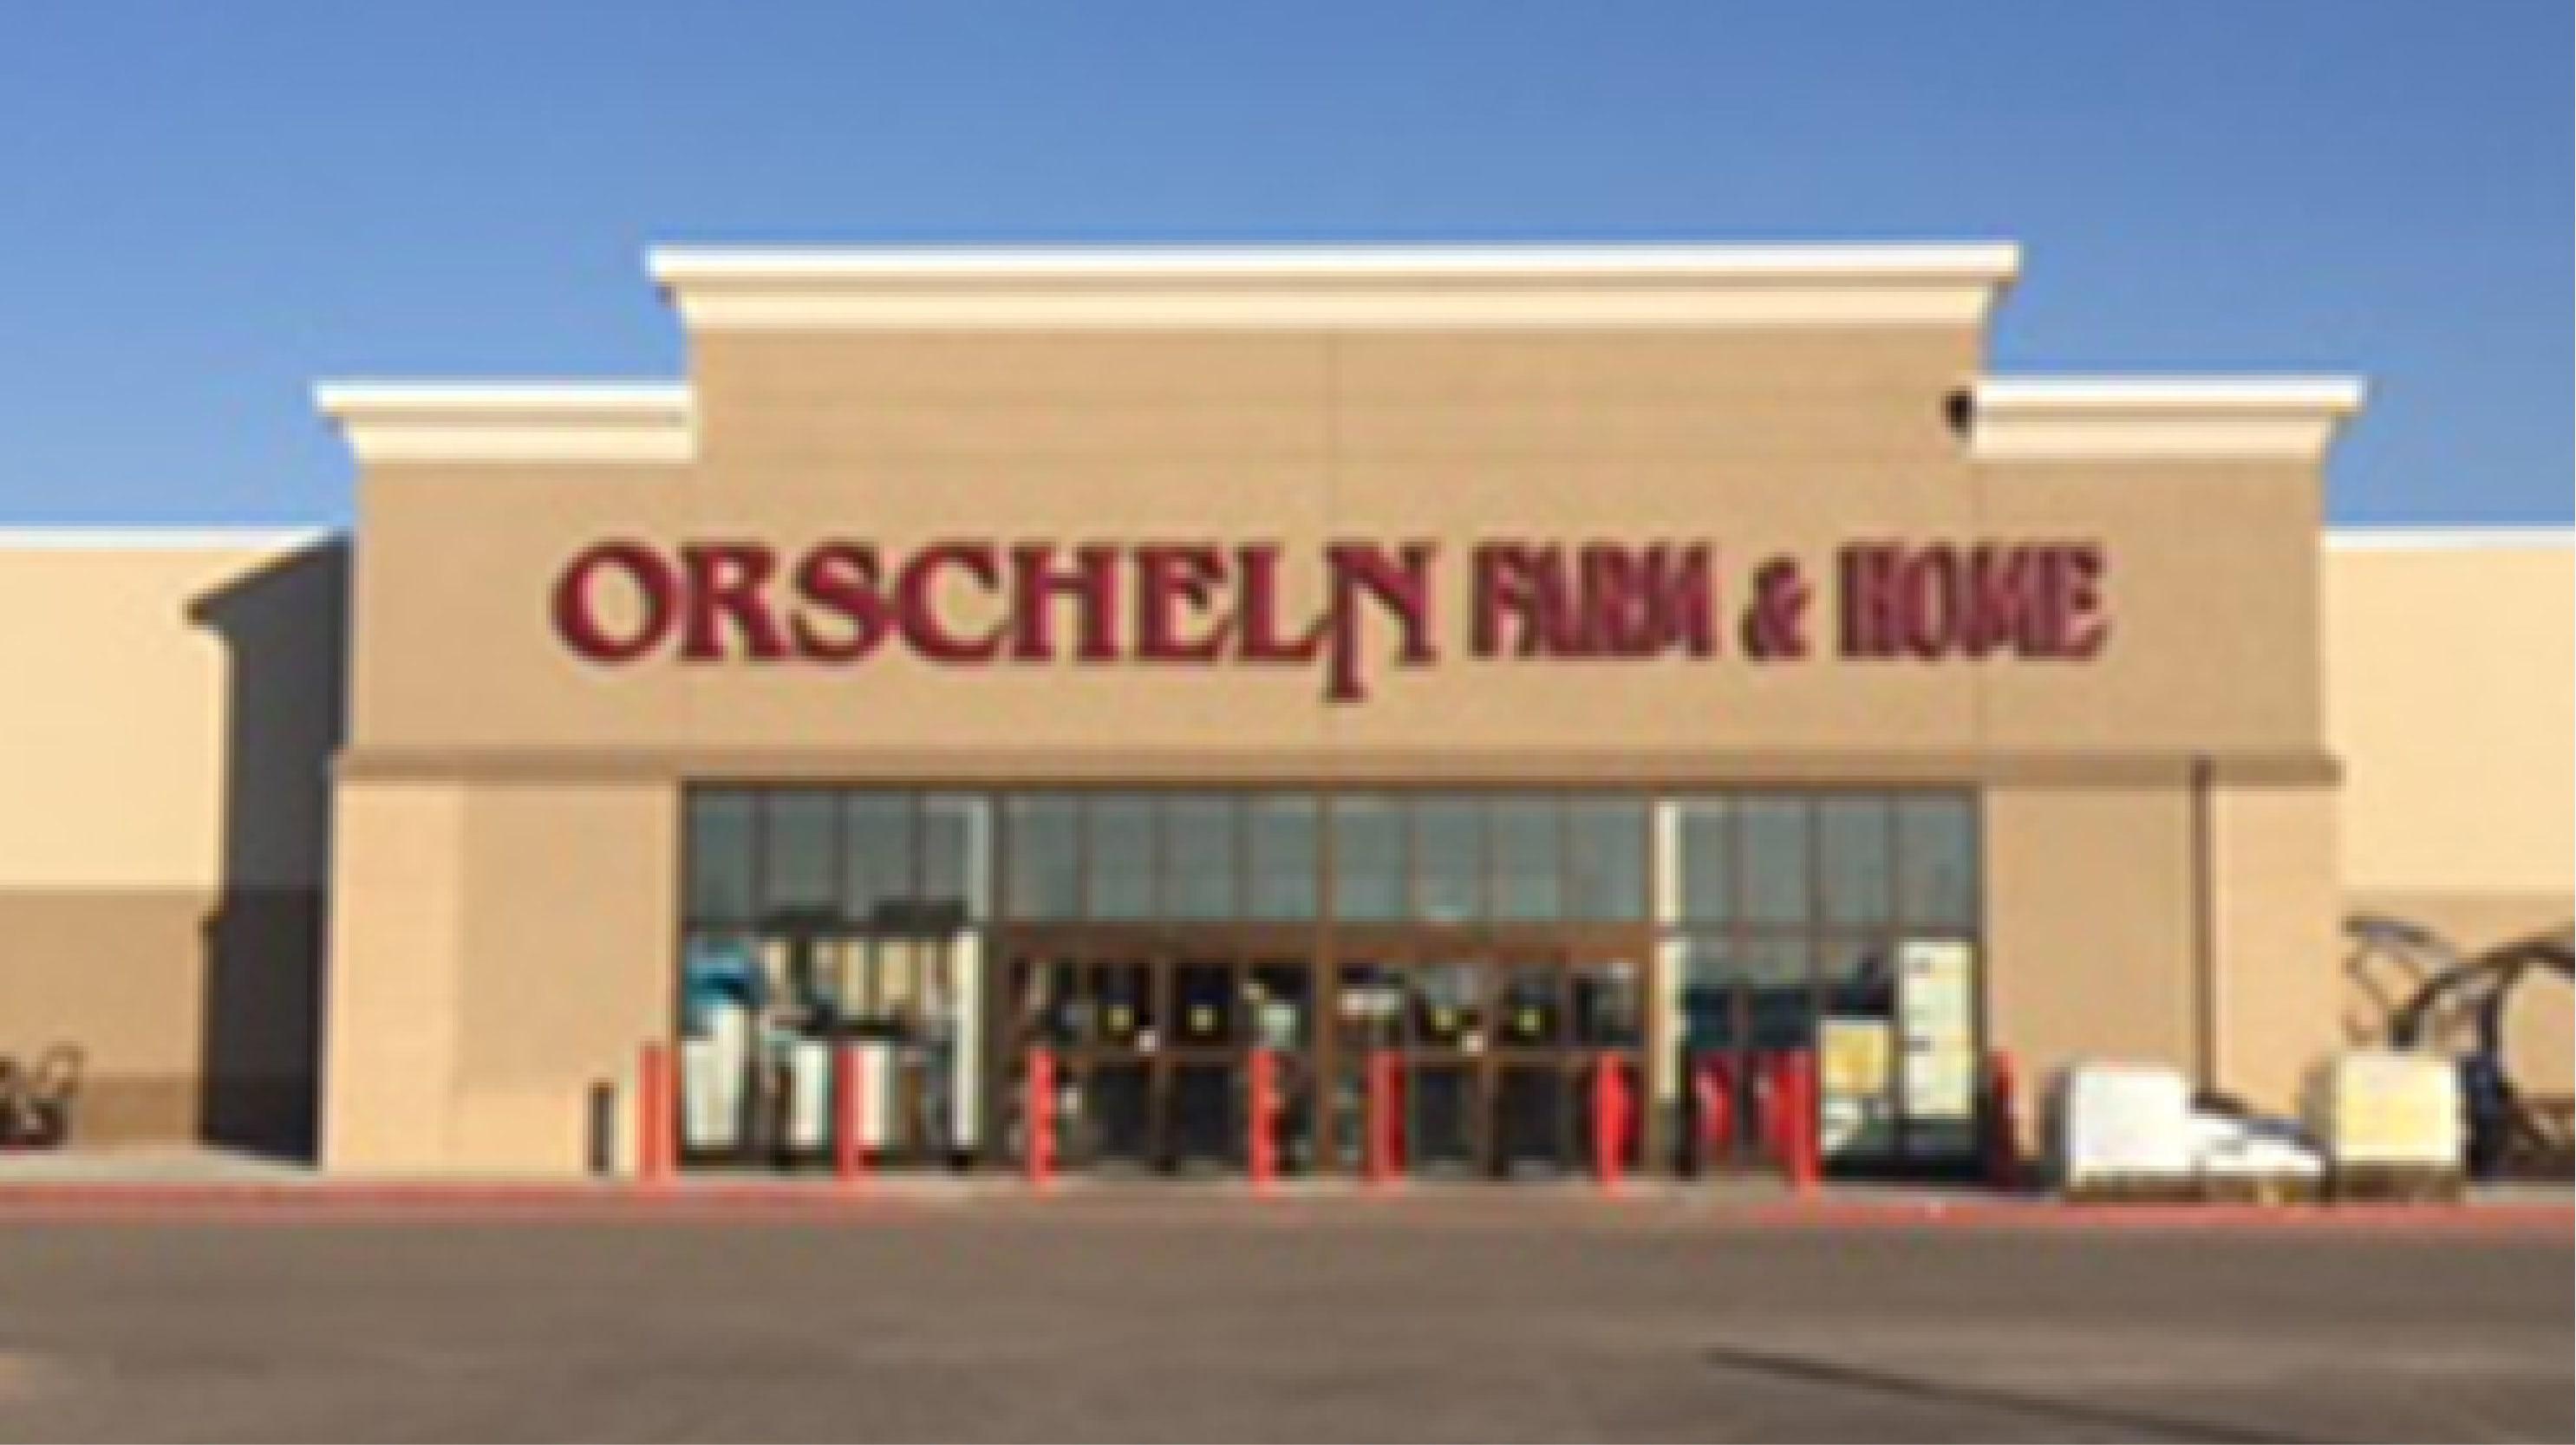 Front view of Orscheln Farm & Home Store in Hutchinson, Kansas 67501